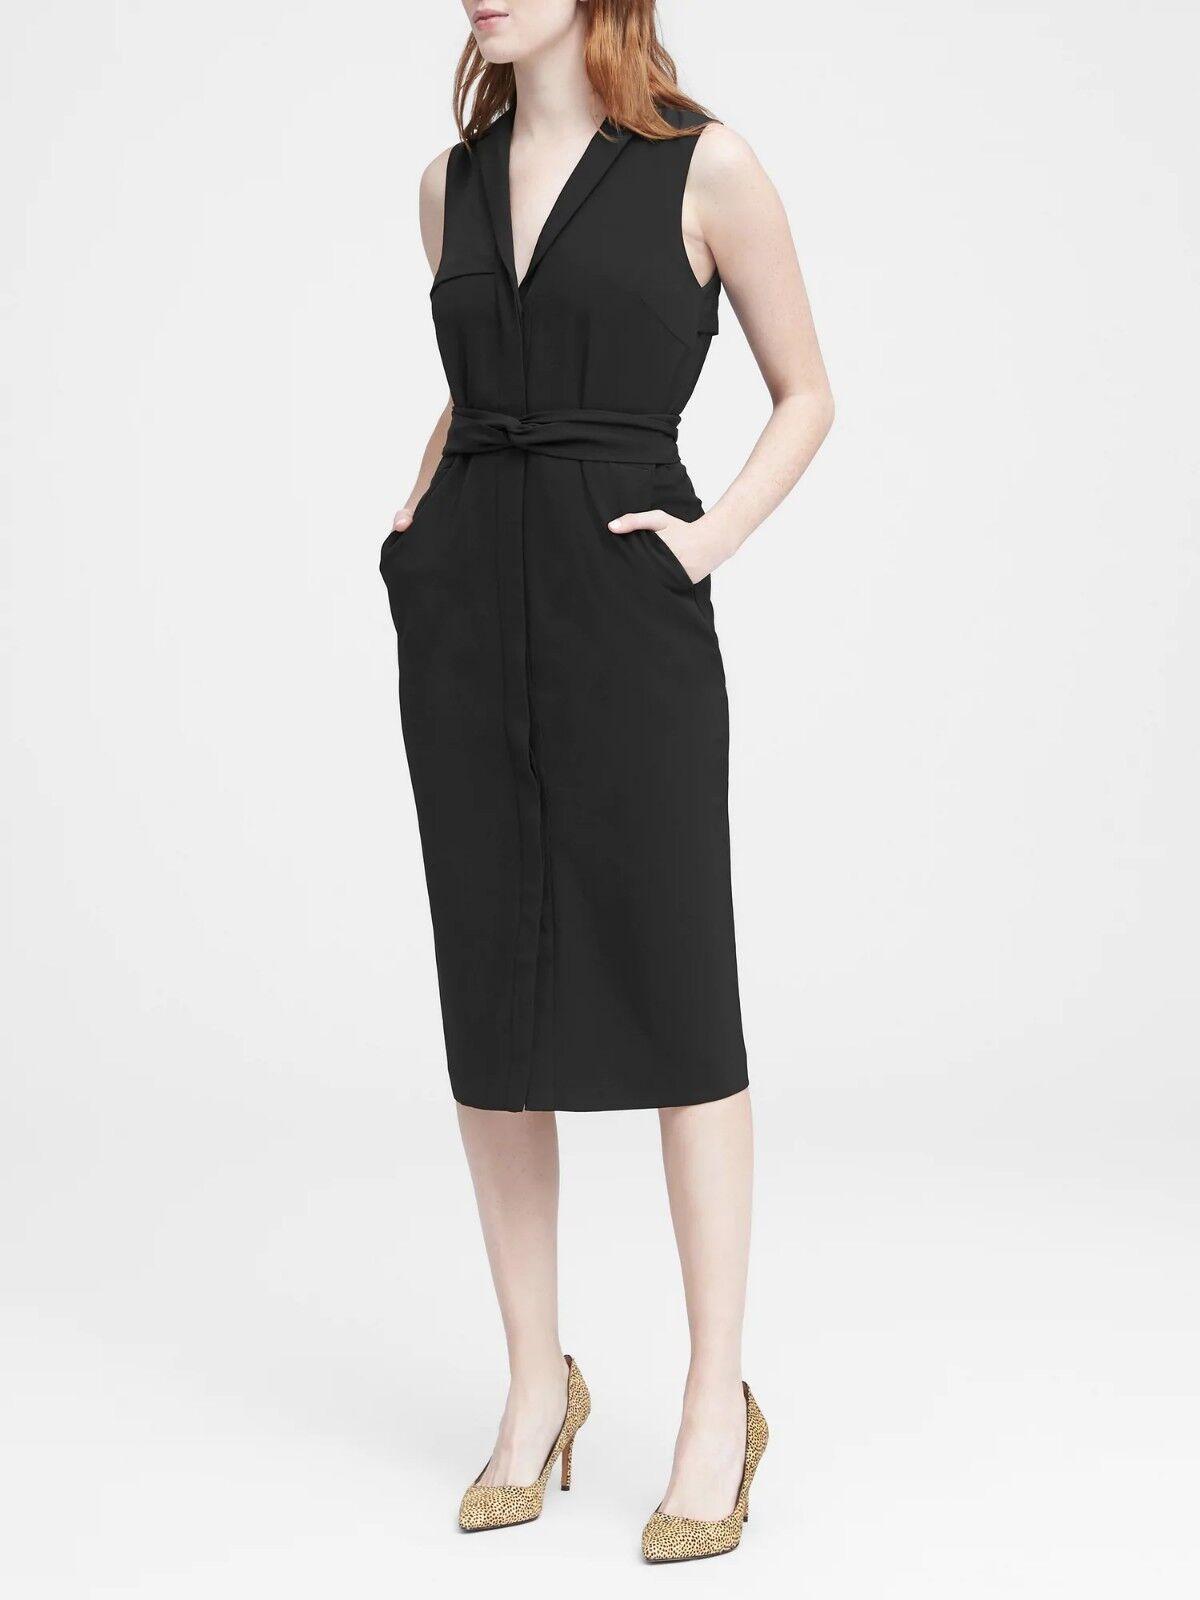 NWOT Banana Republic Trench Dress, schwarz Größe 6                    E1230